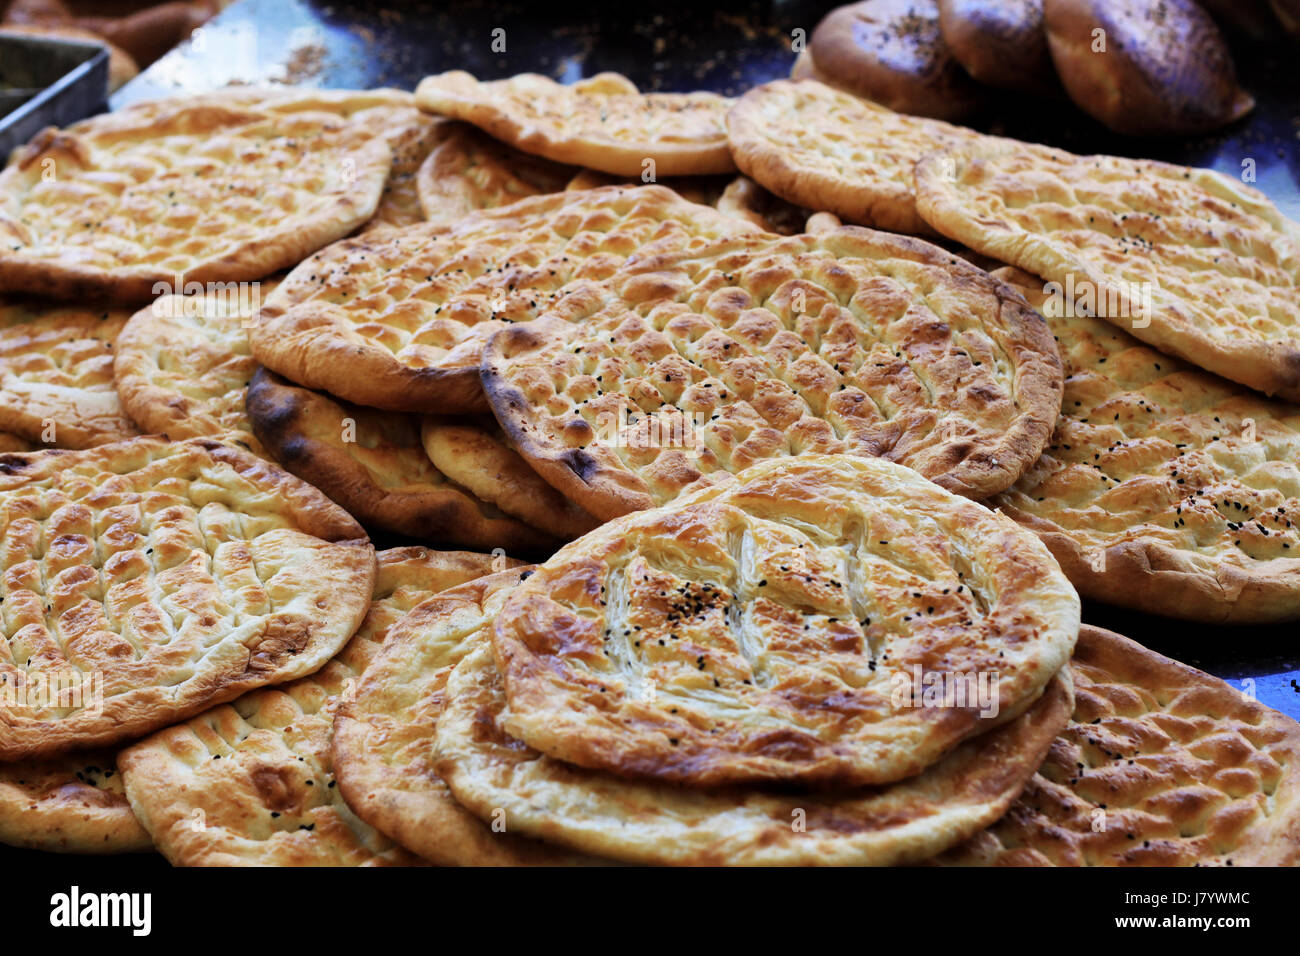 Fresh baked flatbread - Stock Image